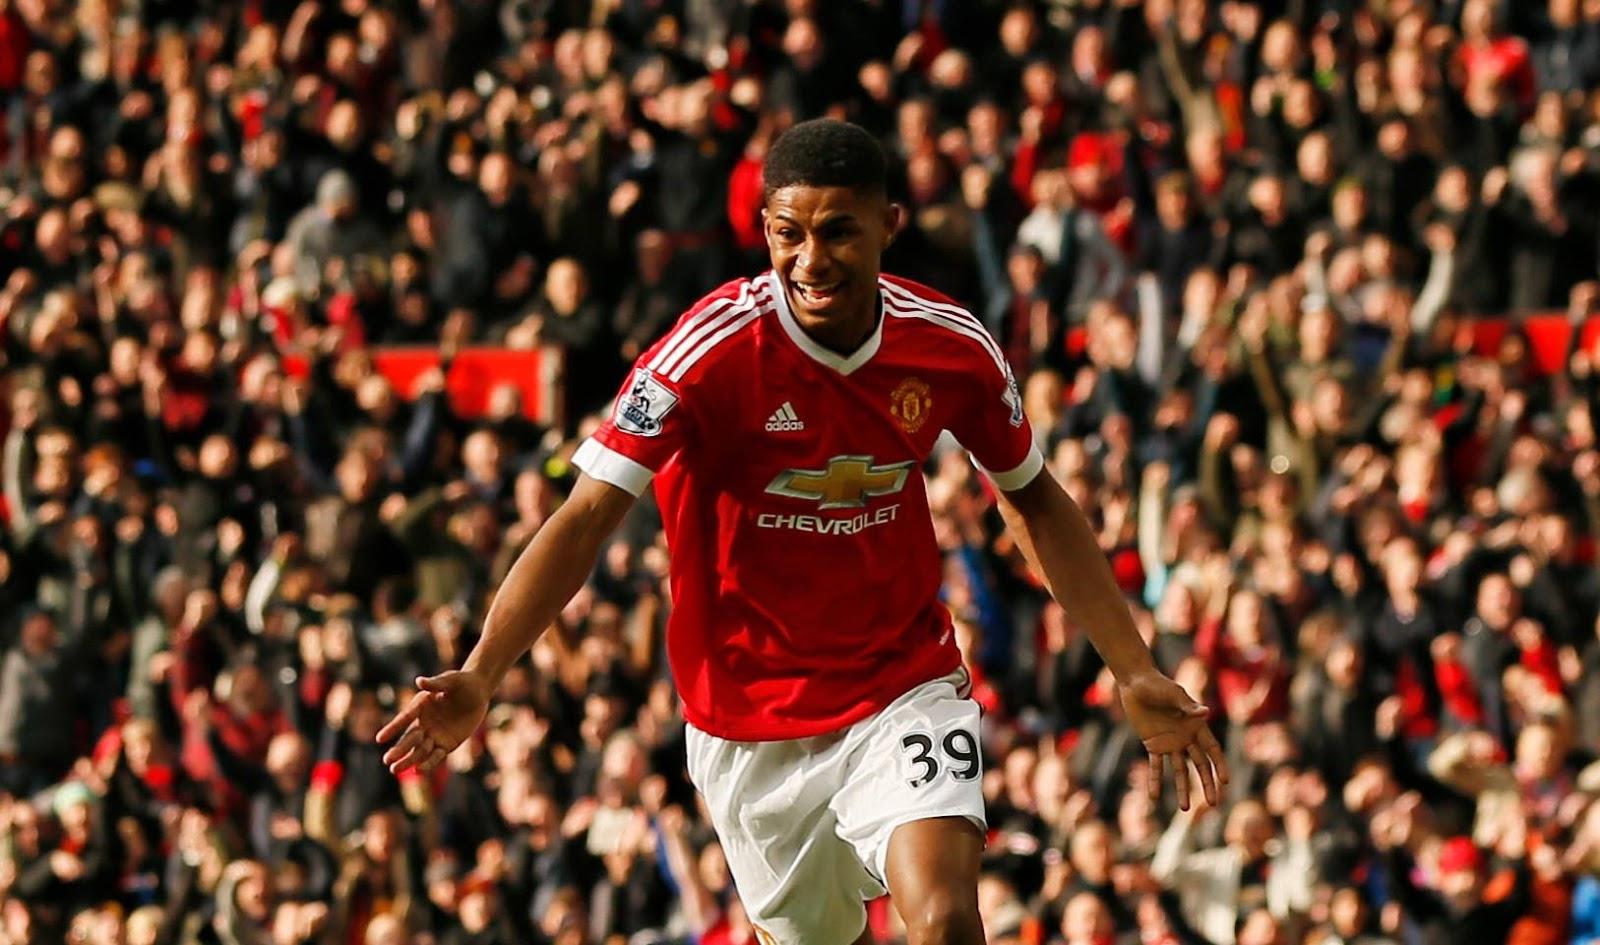 Susunan Pemain Chelsea Melawan Manchester United - Rashford Jadi Harapan Mourinho